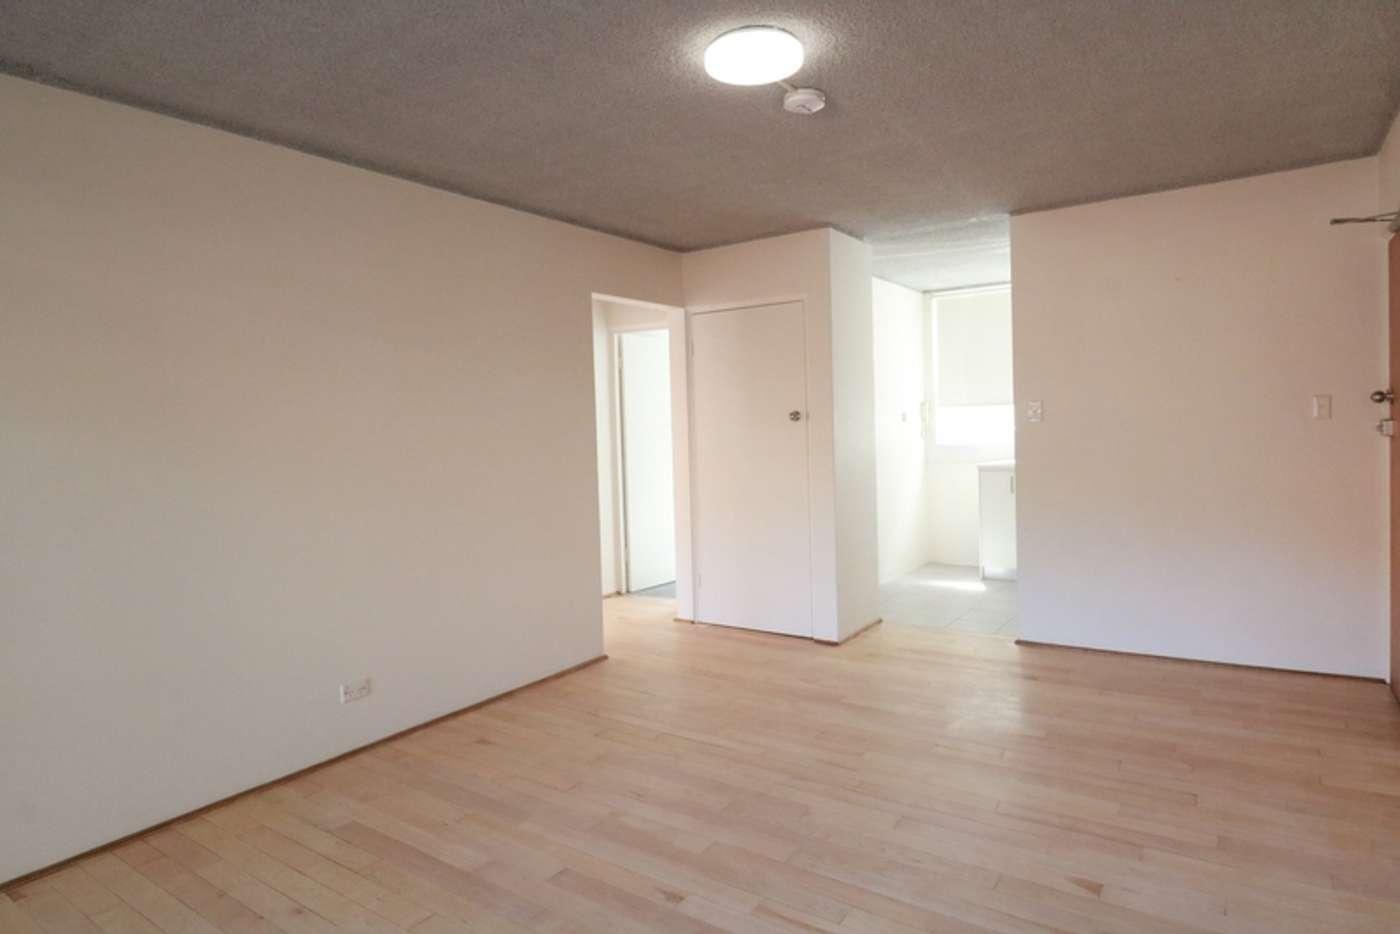 Main view of Homely unit listing, 8/ 8 Webbs Avenue, Ashfield NSW 2131